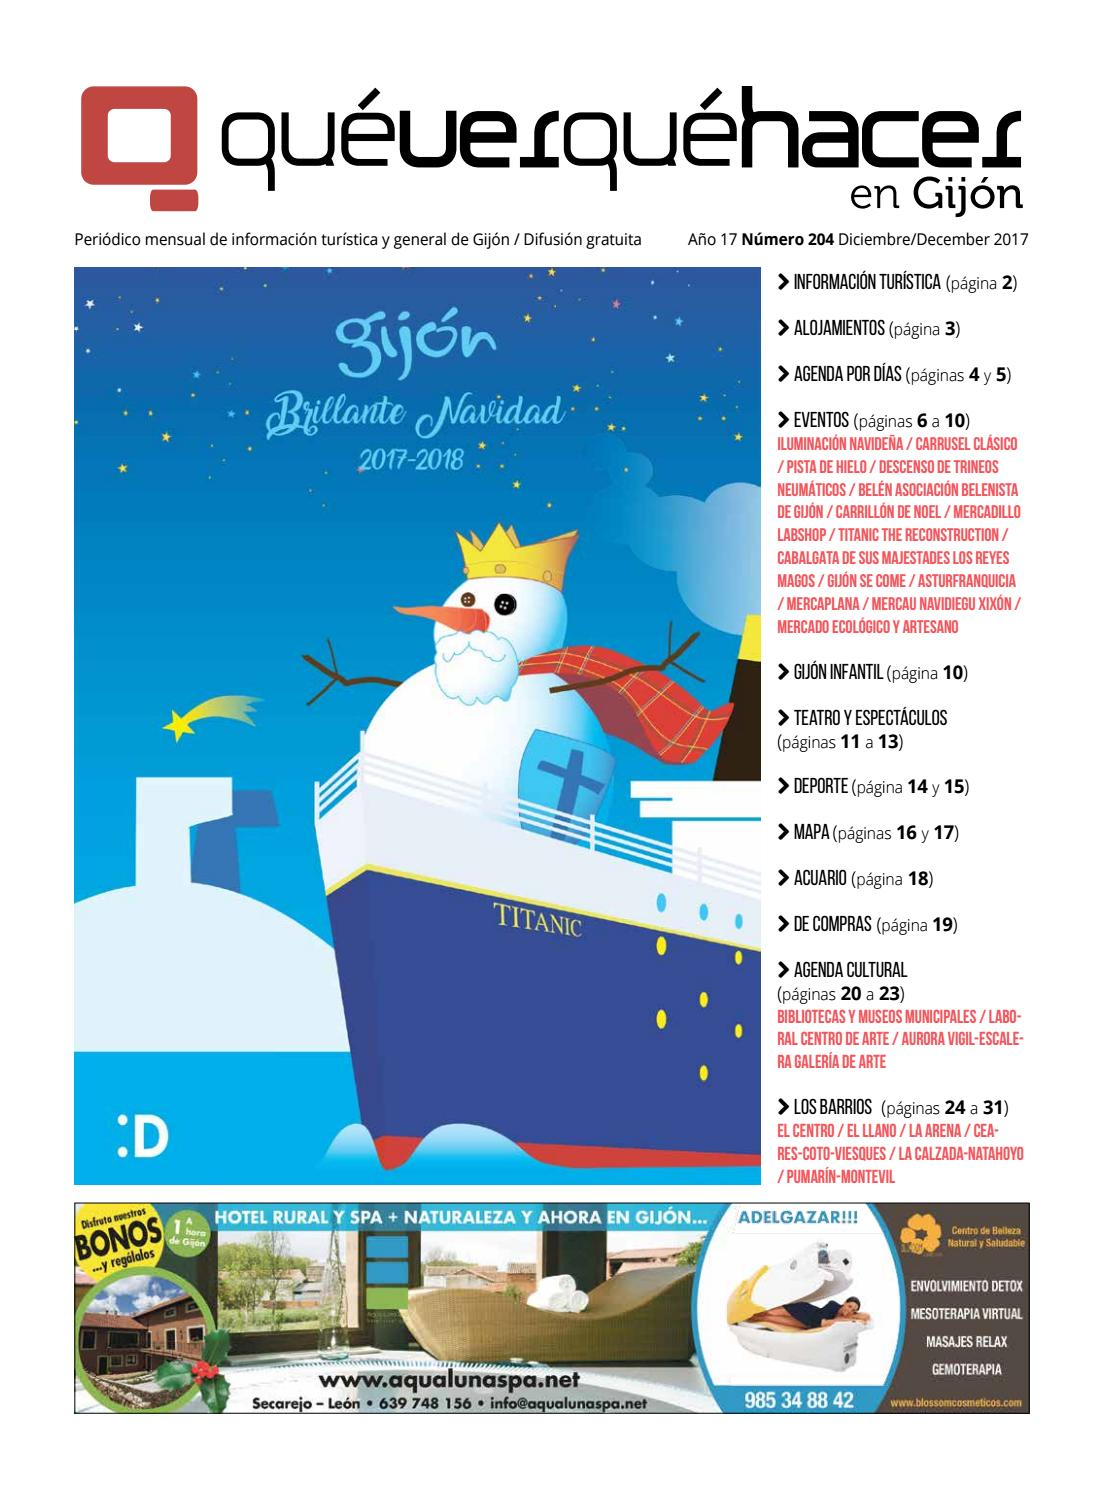 22cce3b970 Que ver que hacer en gijon diciembre 2017 by uve comunicacion - issuu